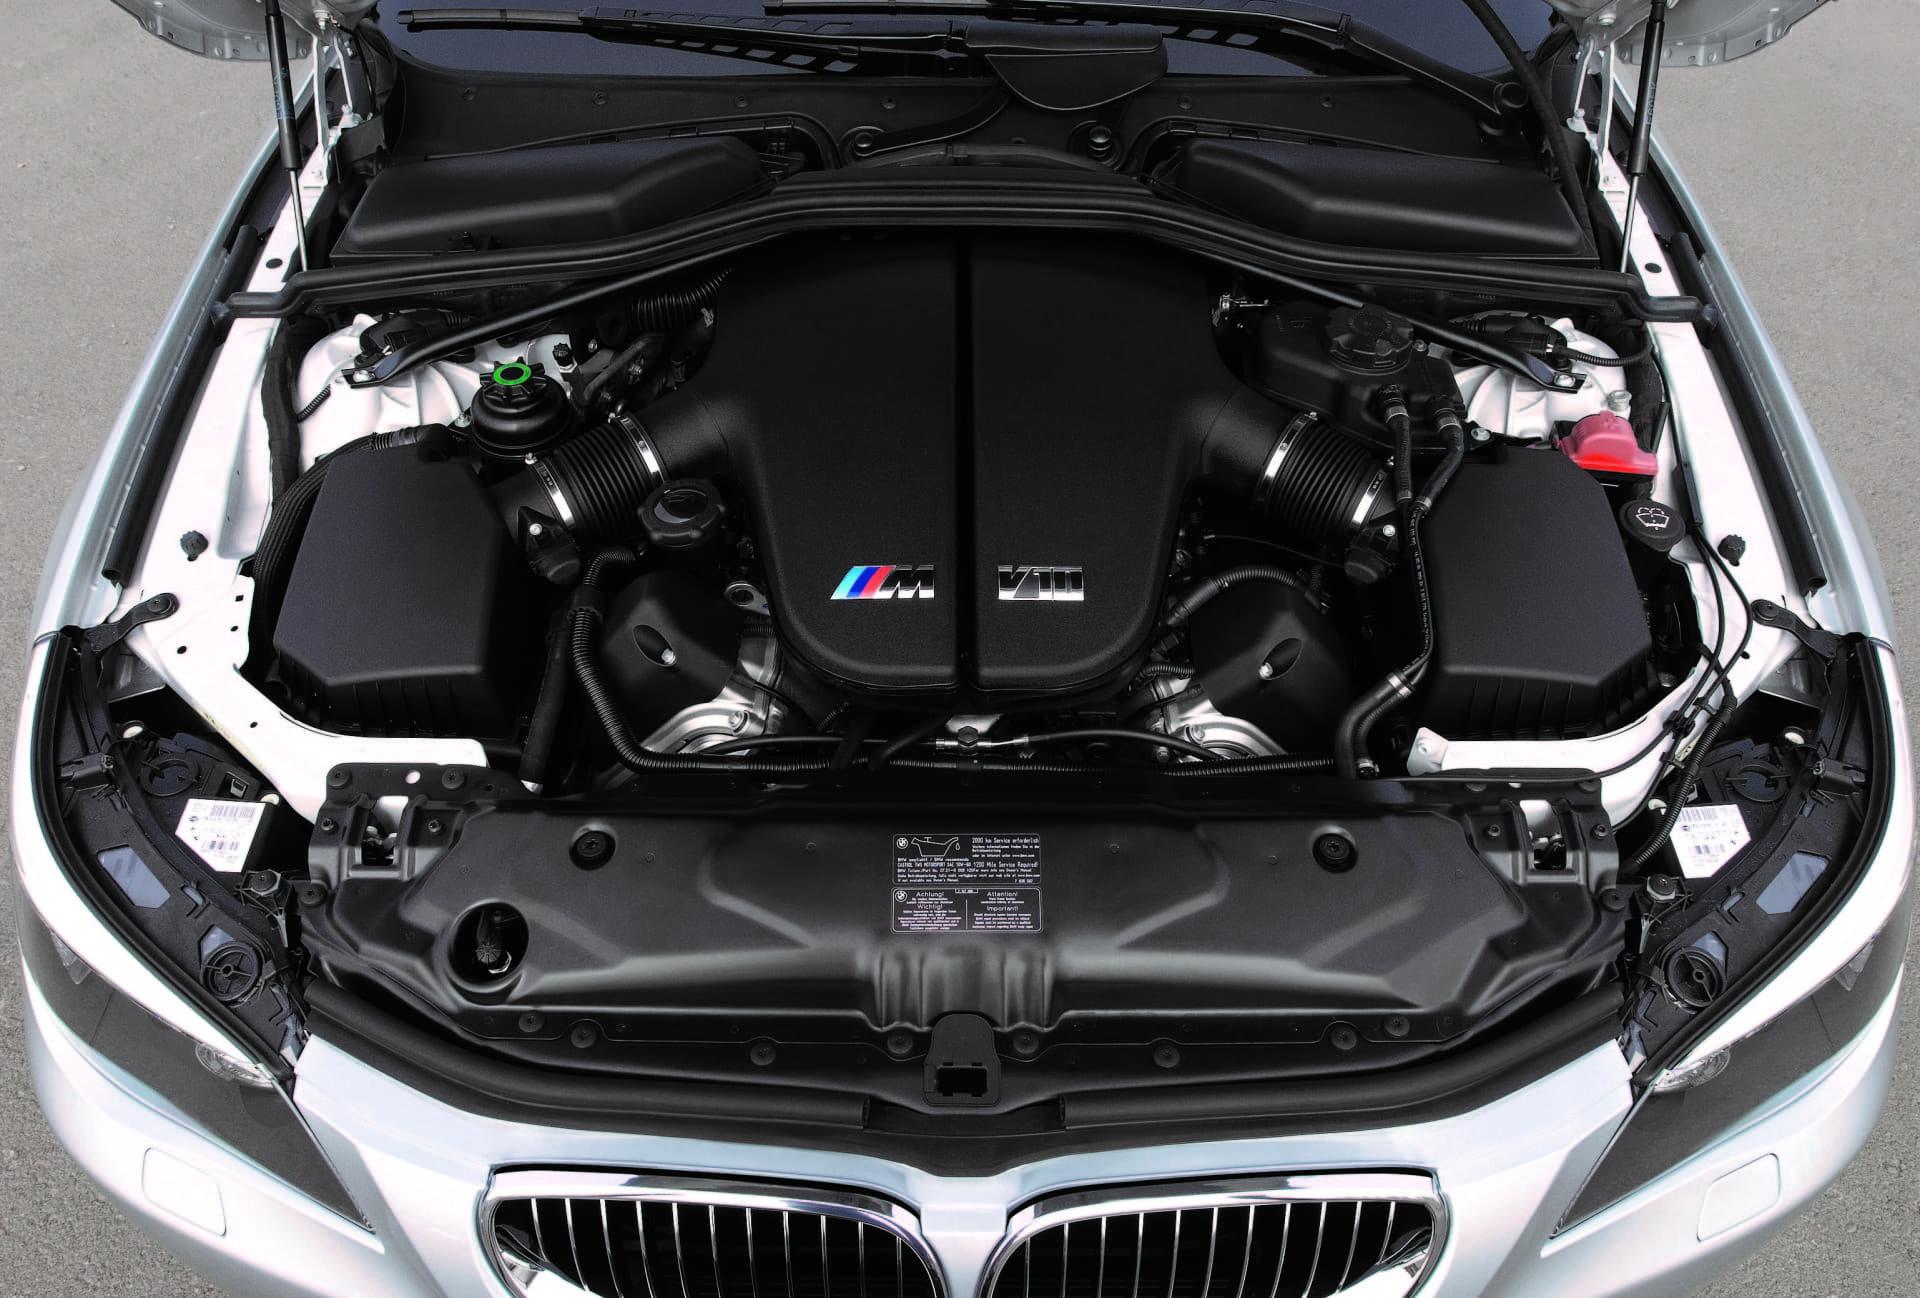 Motor S85 V10 Bmw M5 E60 19